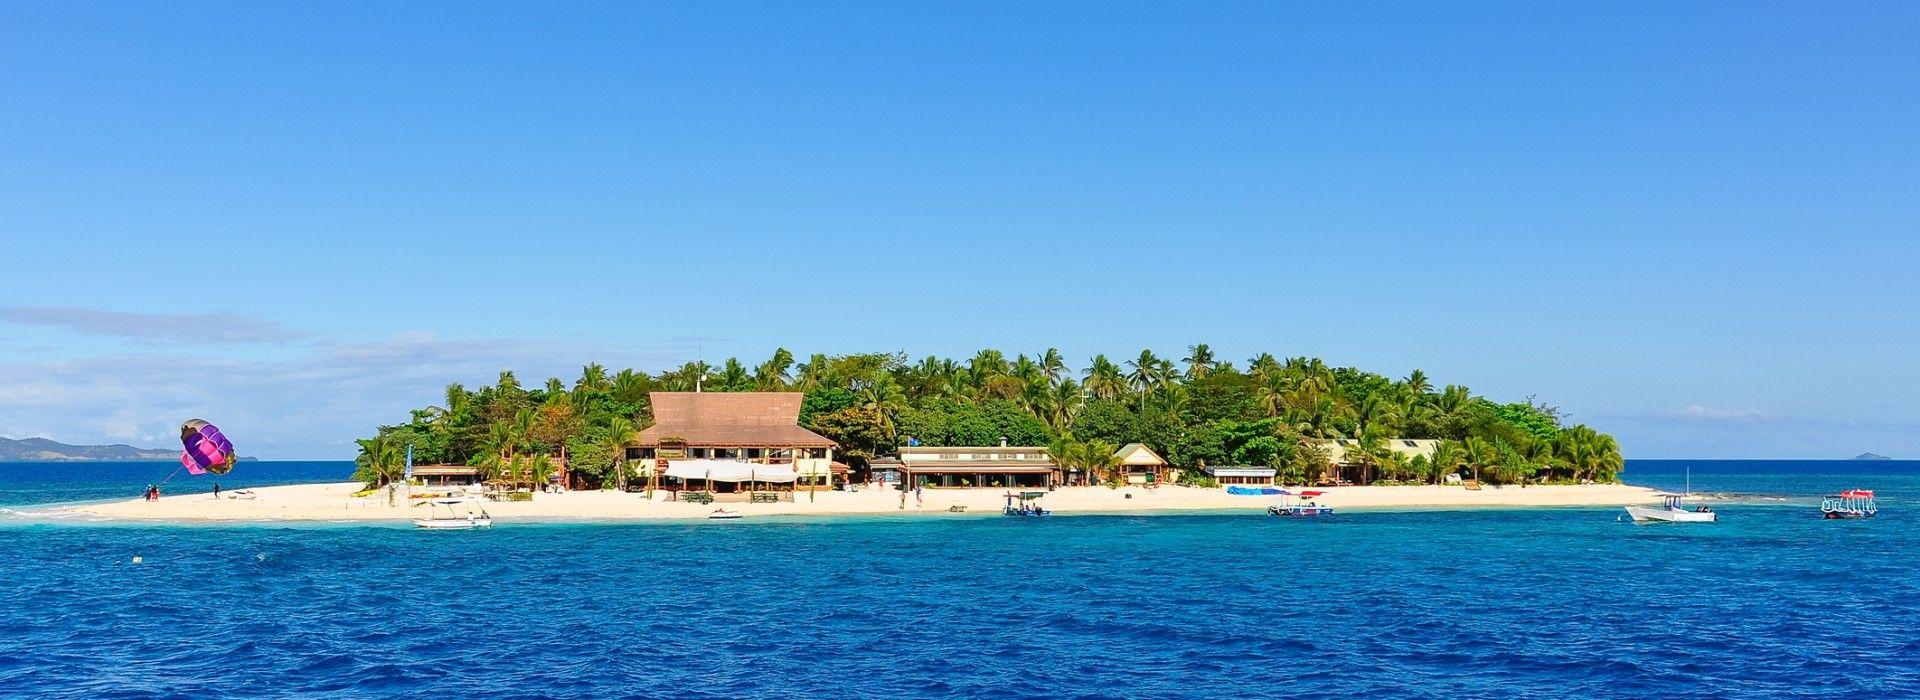 Luxury Tours in Oceania